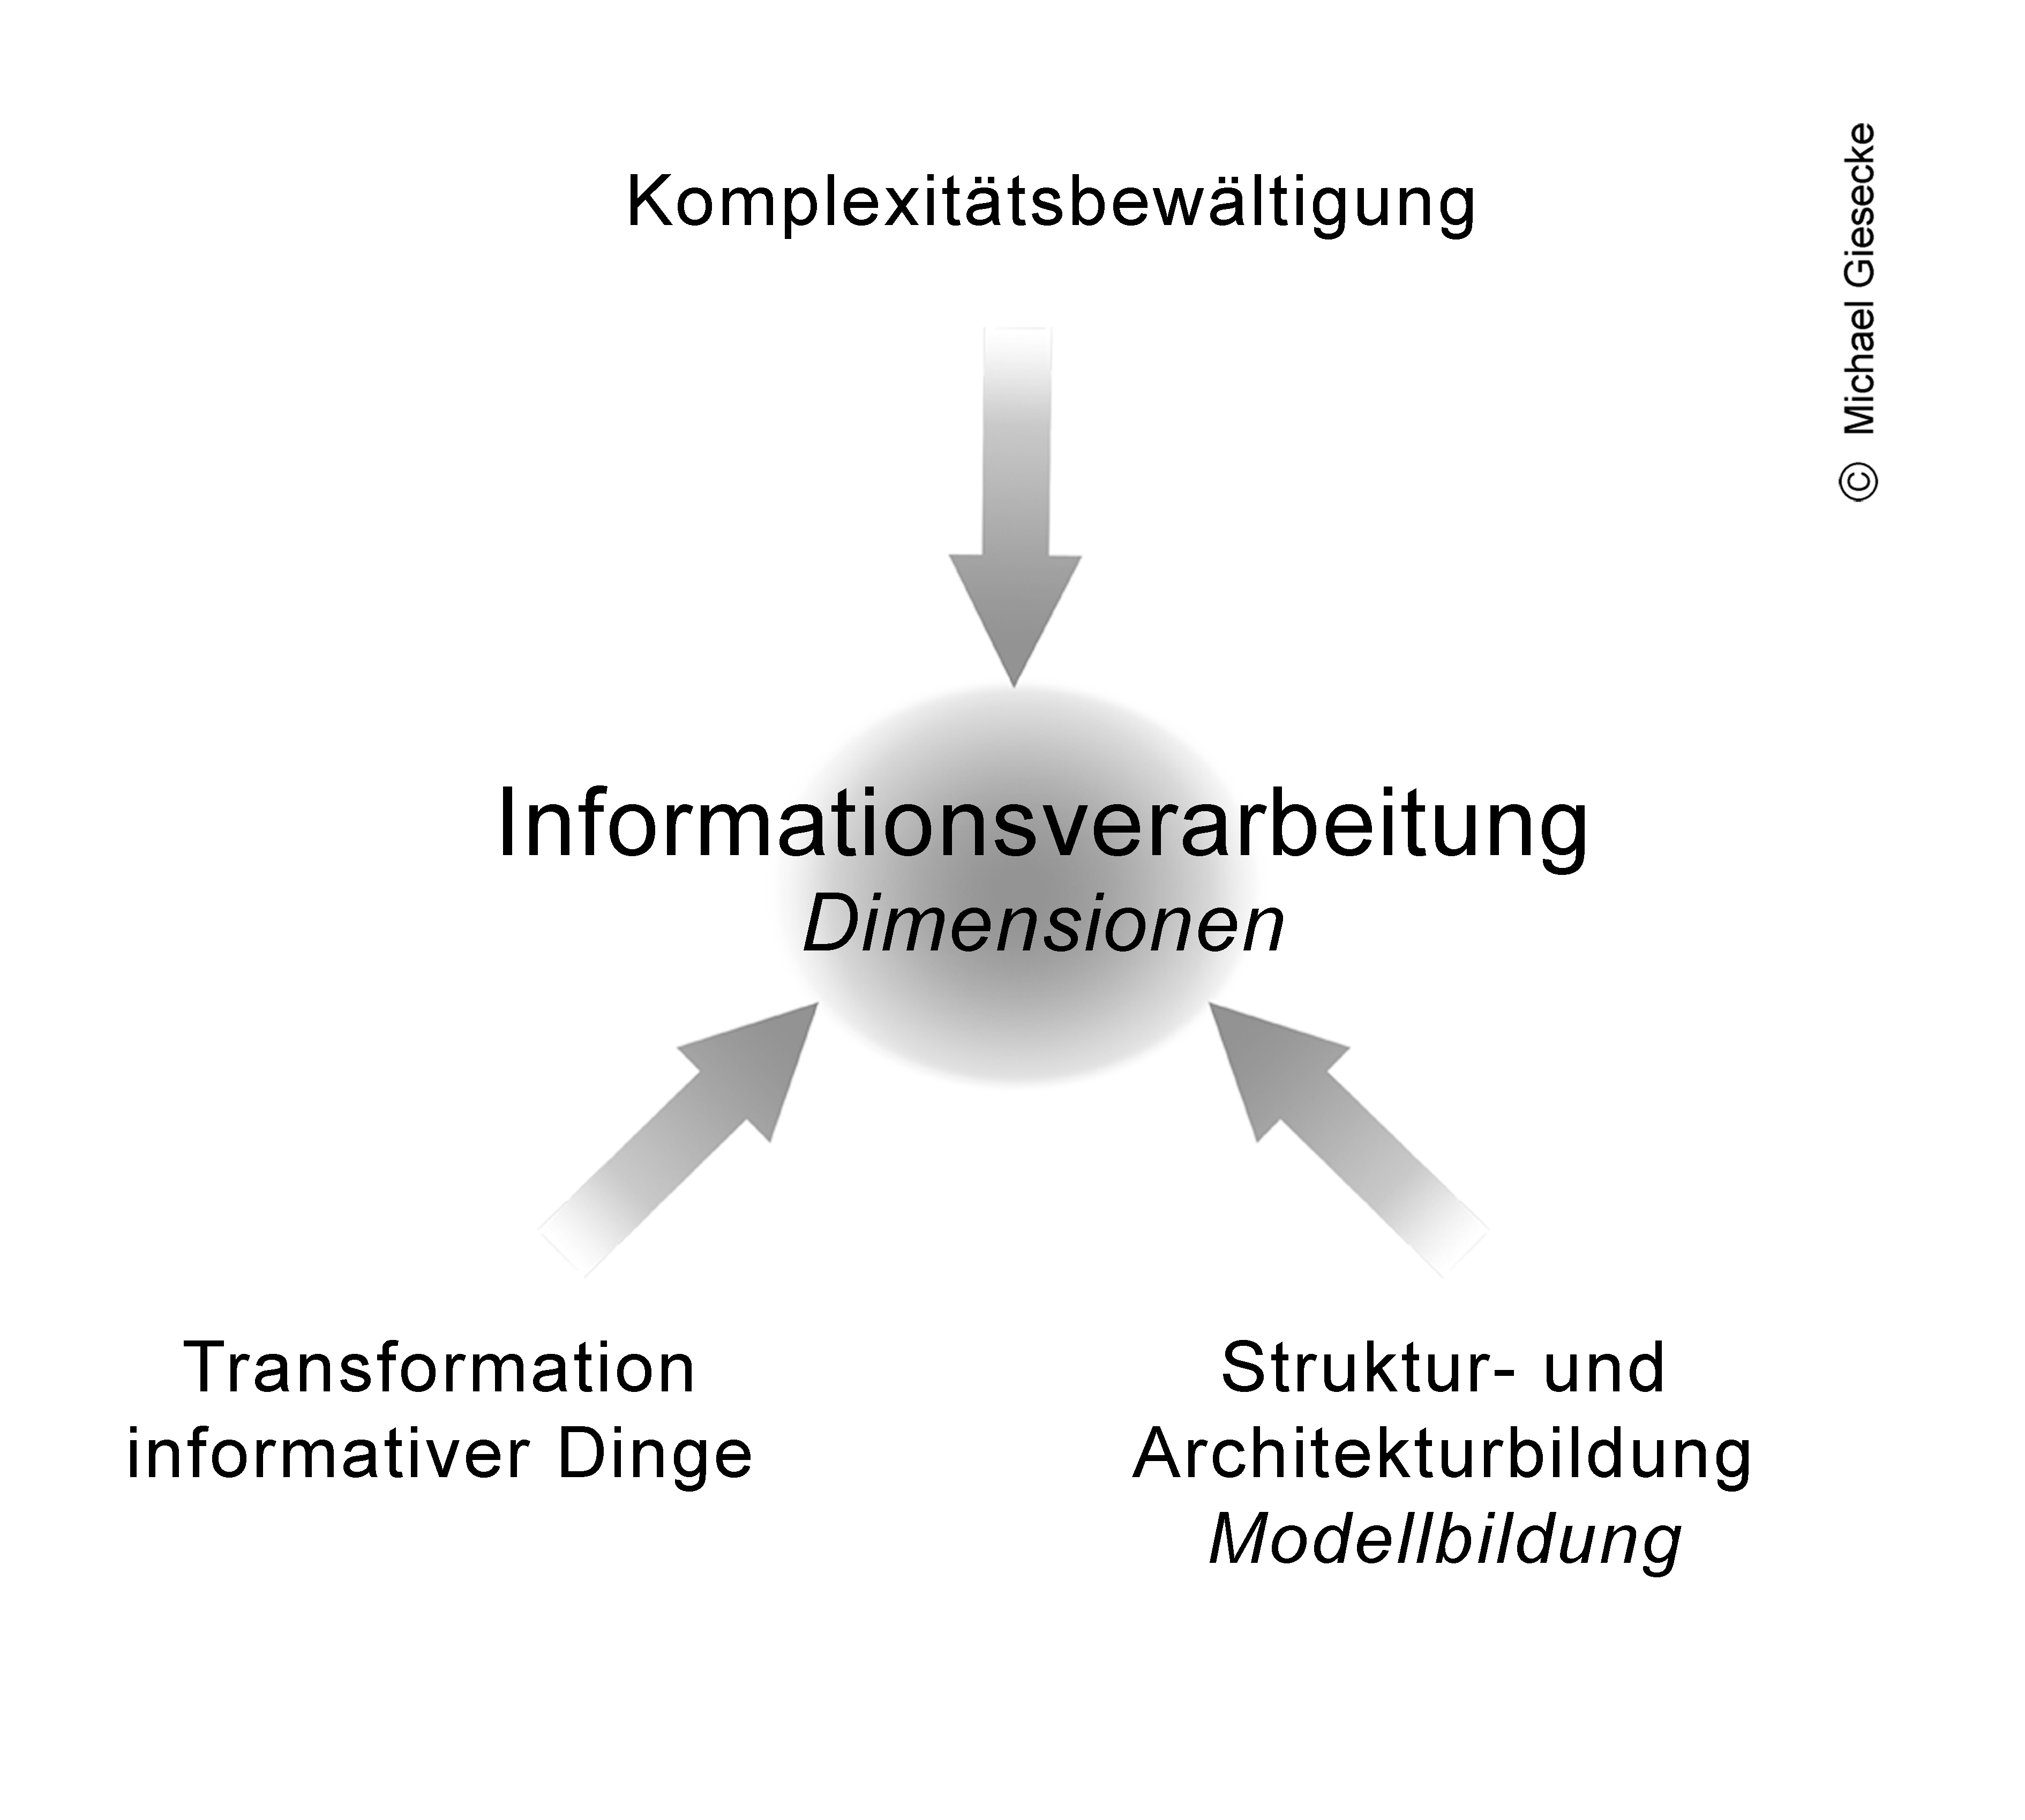 Informationsverarbeitungstriade